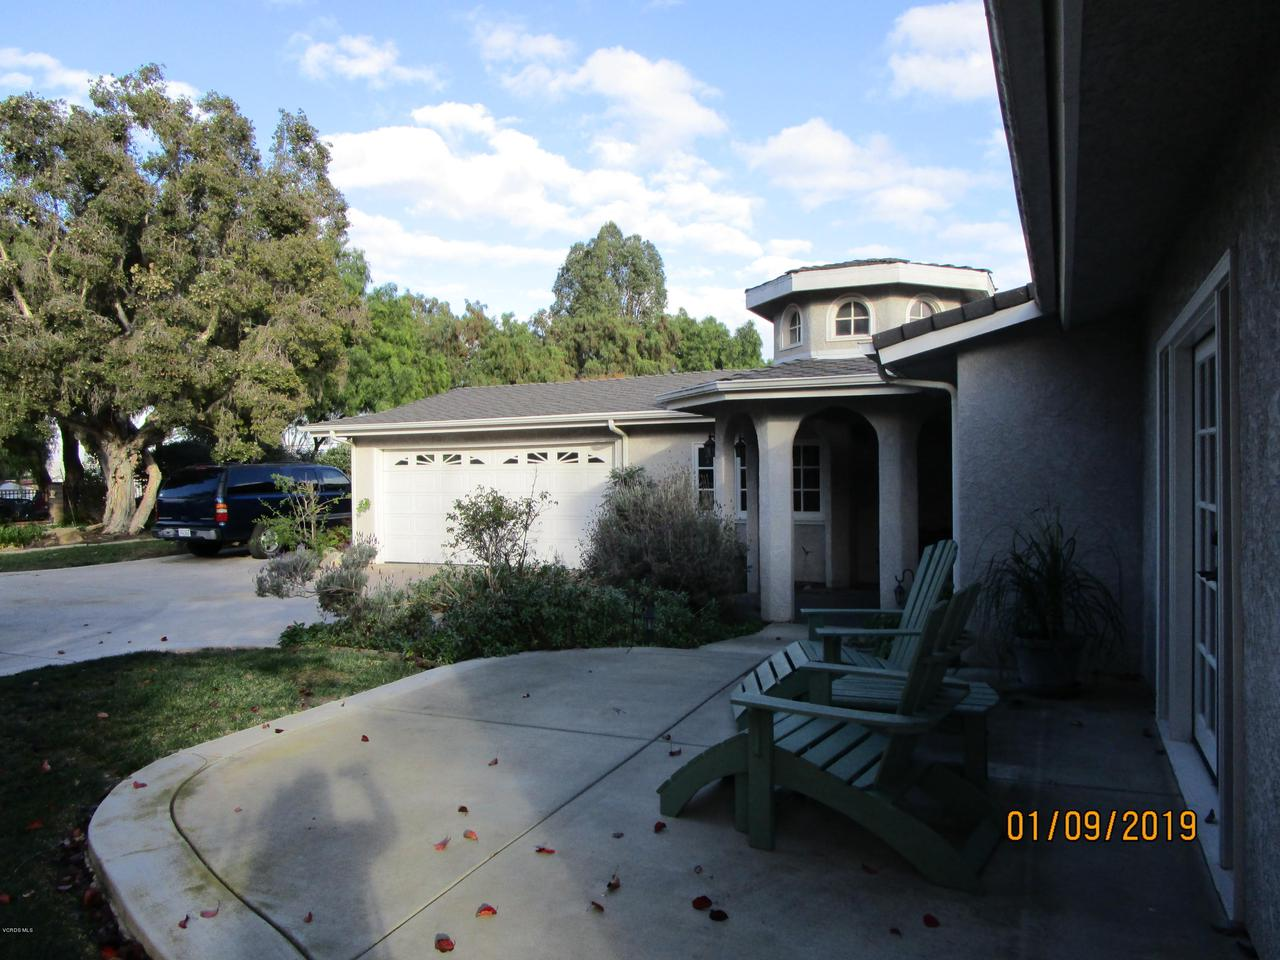 10720 TERNEZ, Moorpark, CA 93021 - Front Porch